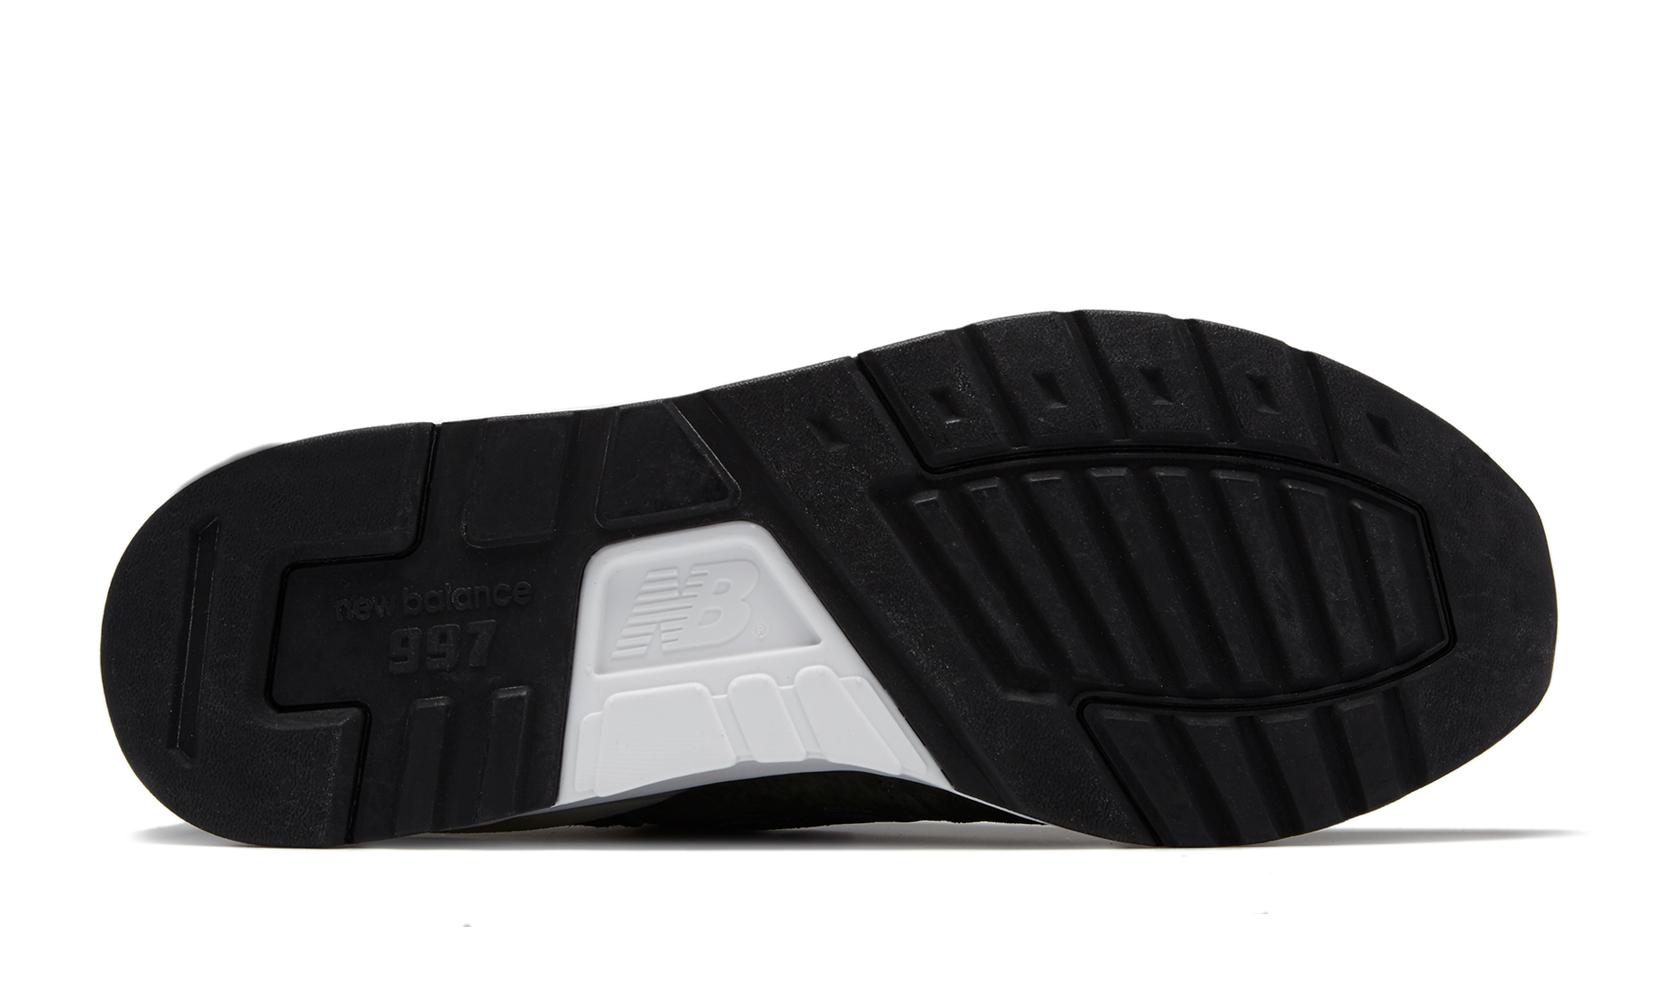 Чоловіче взуття повсякденне  997 Made in US M997HB2 | New Balance